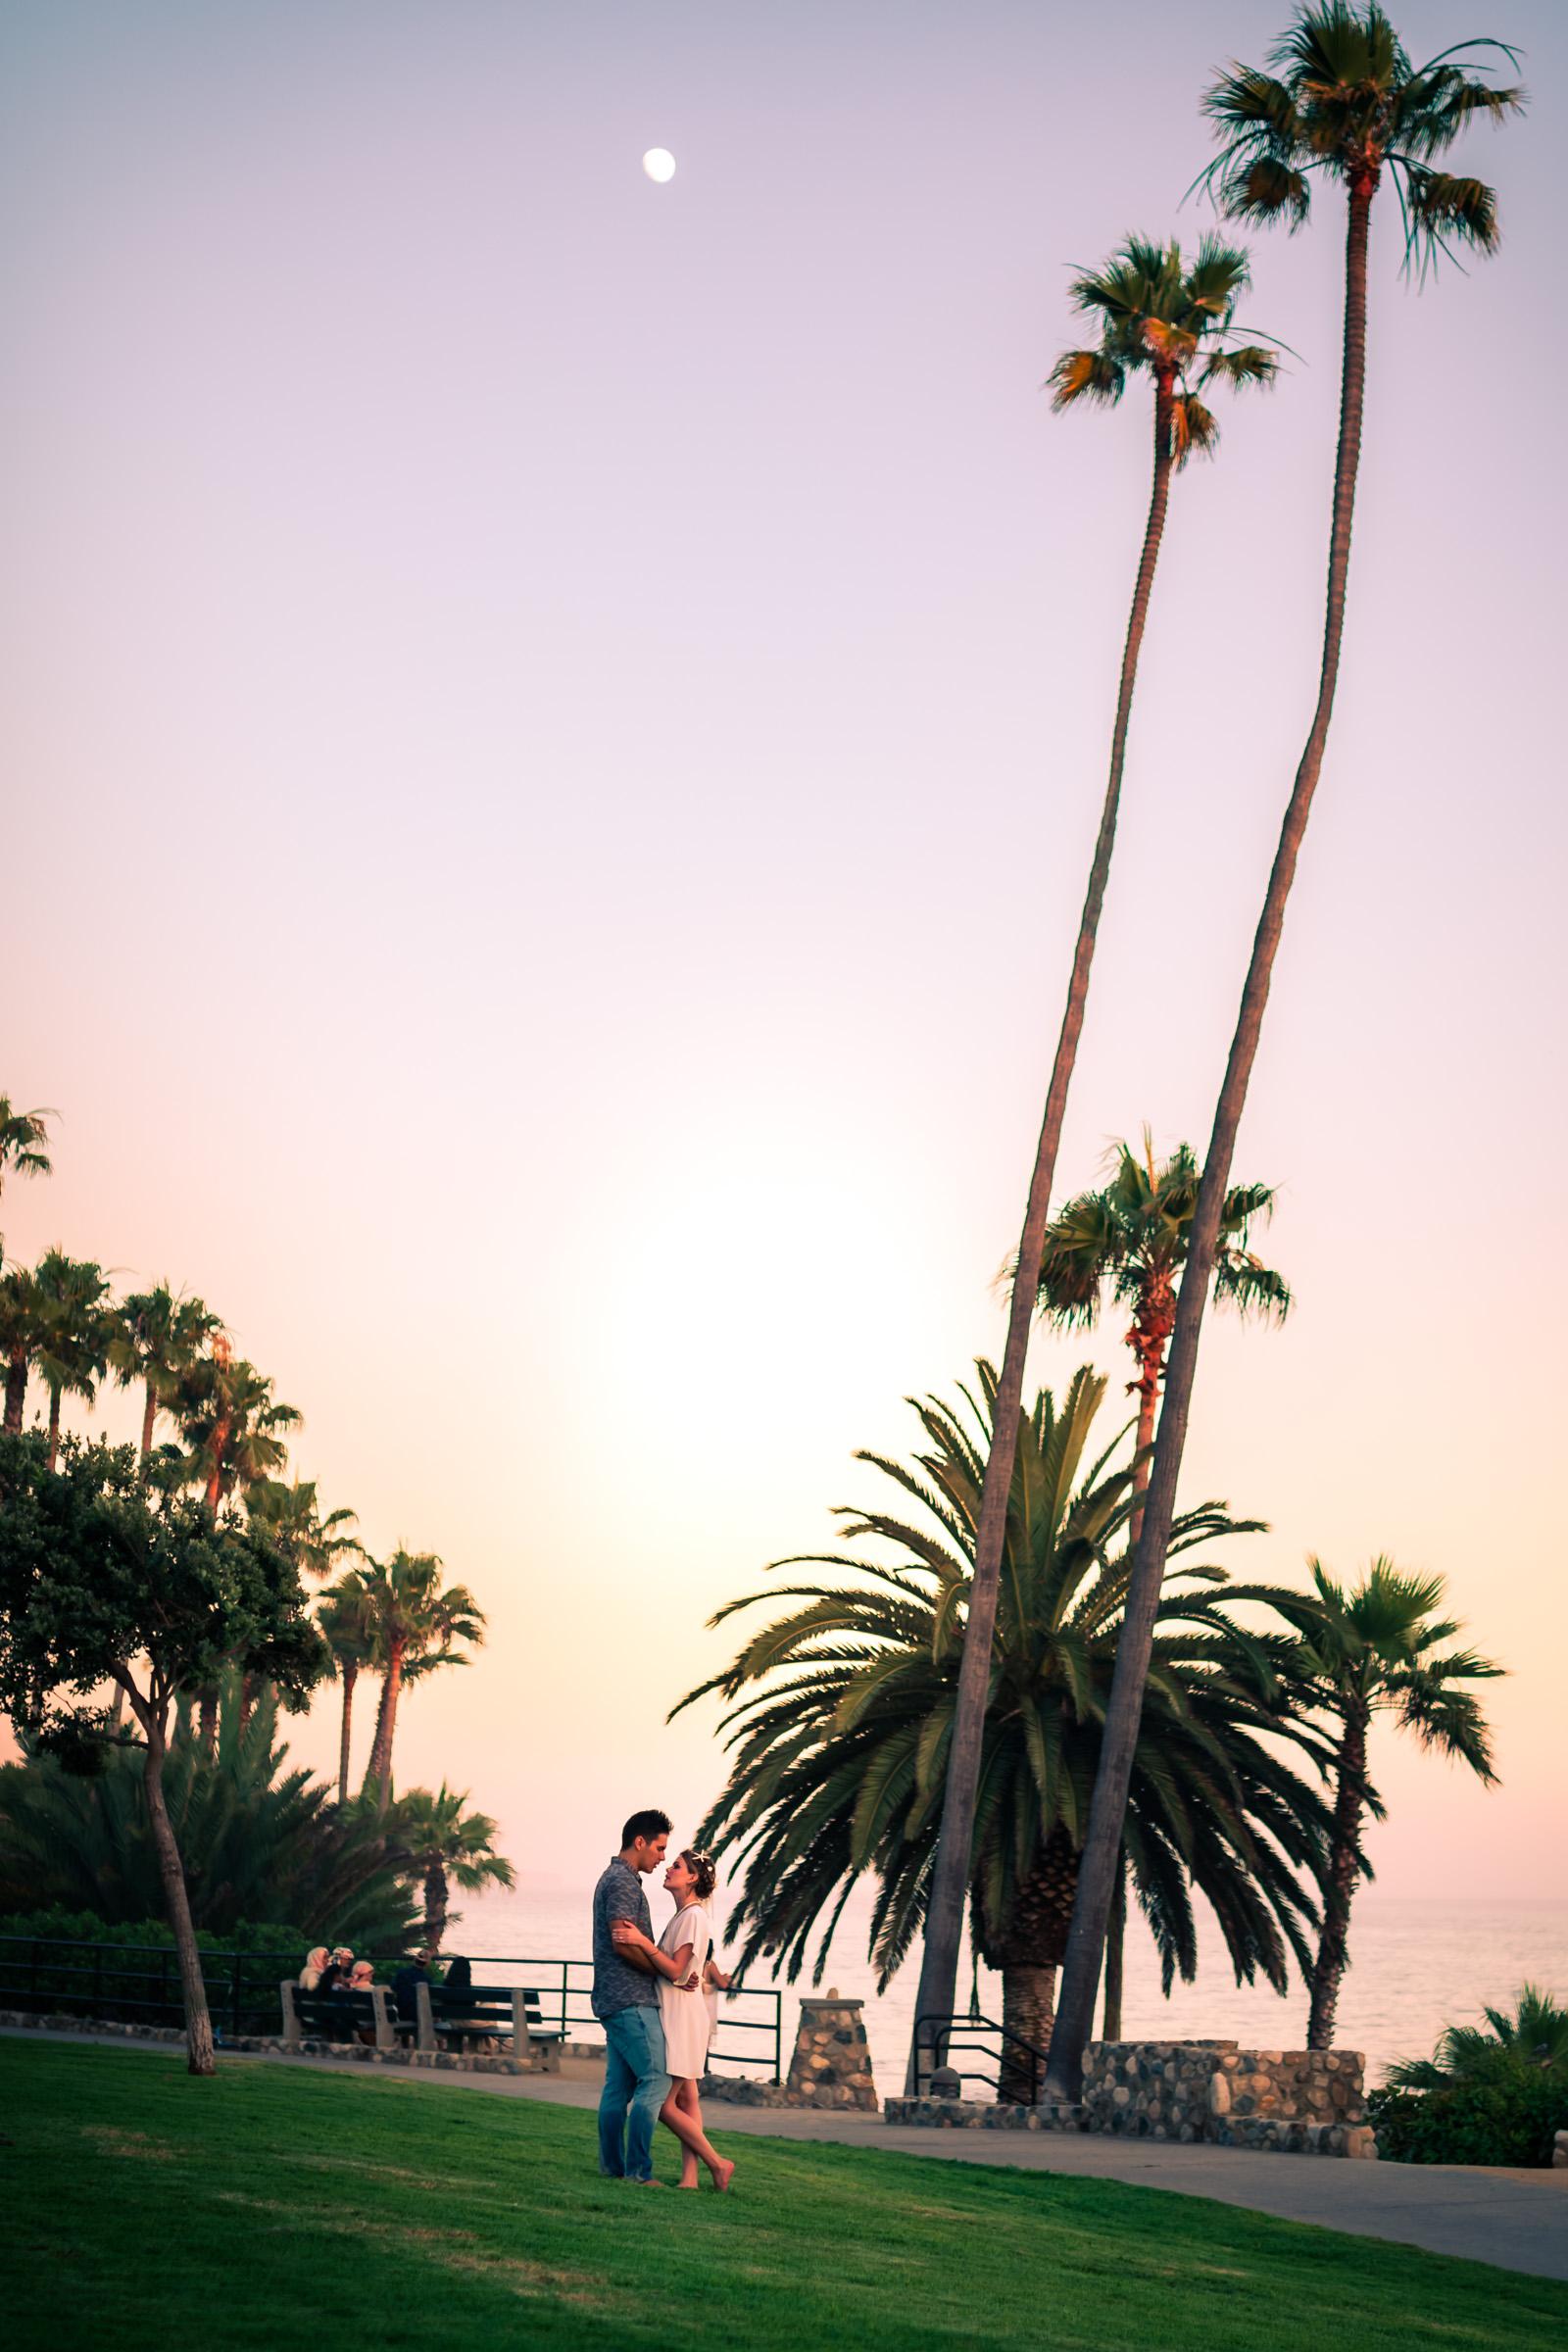 61__Bruno-Amanda-Laguna-beach-engagement_Joseph-Barber-Weddings_3207.jpg